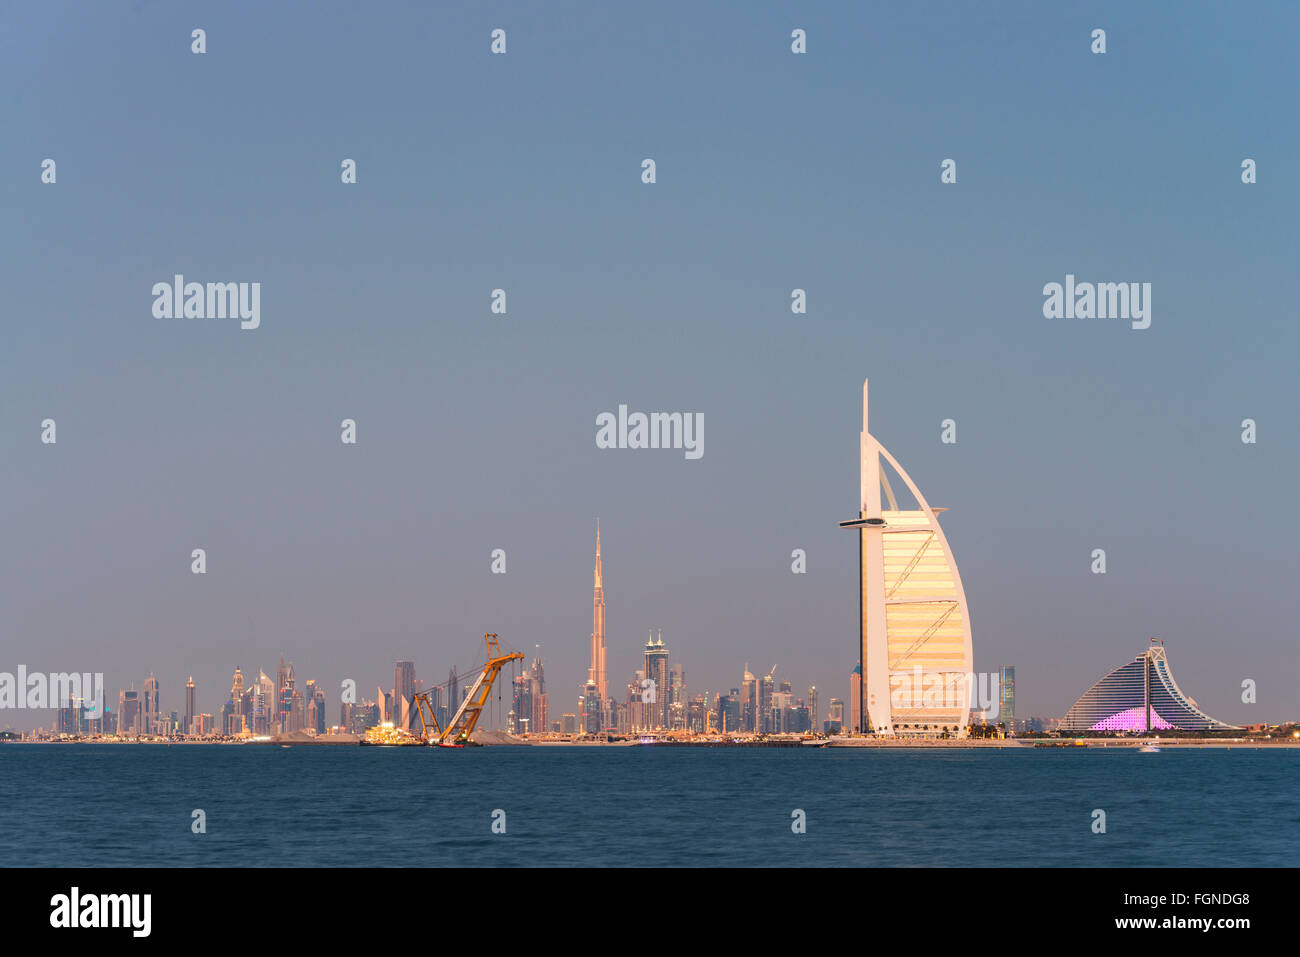 Skyline of Dubai waterfront with Burj al Arab Hotel in United Arab Emirates - Stock Image